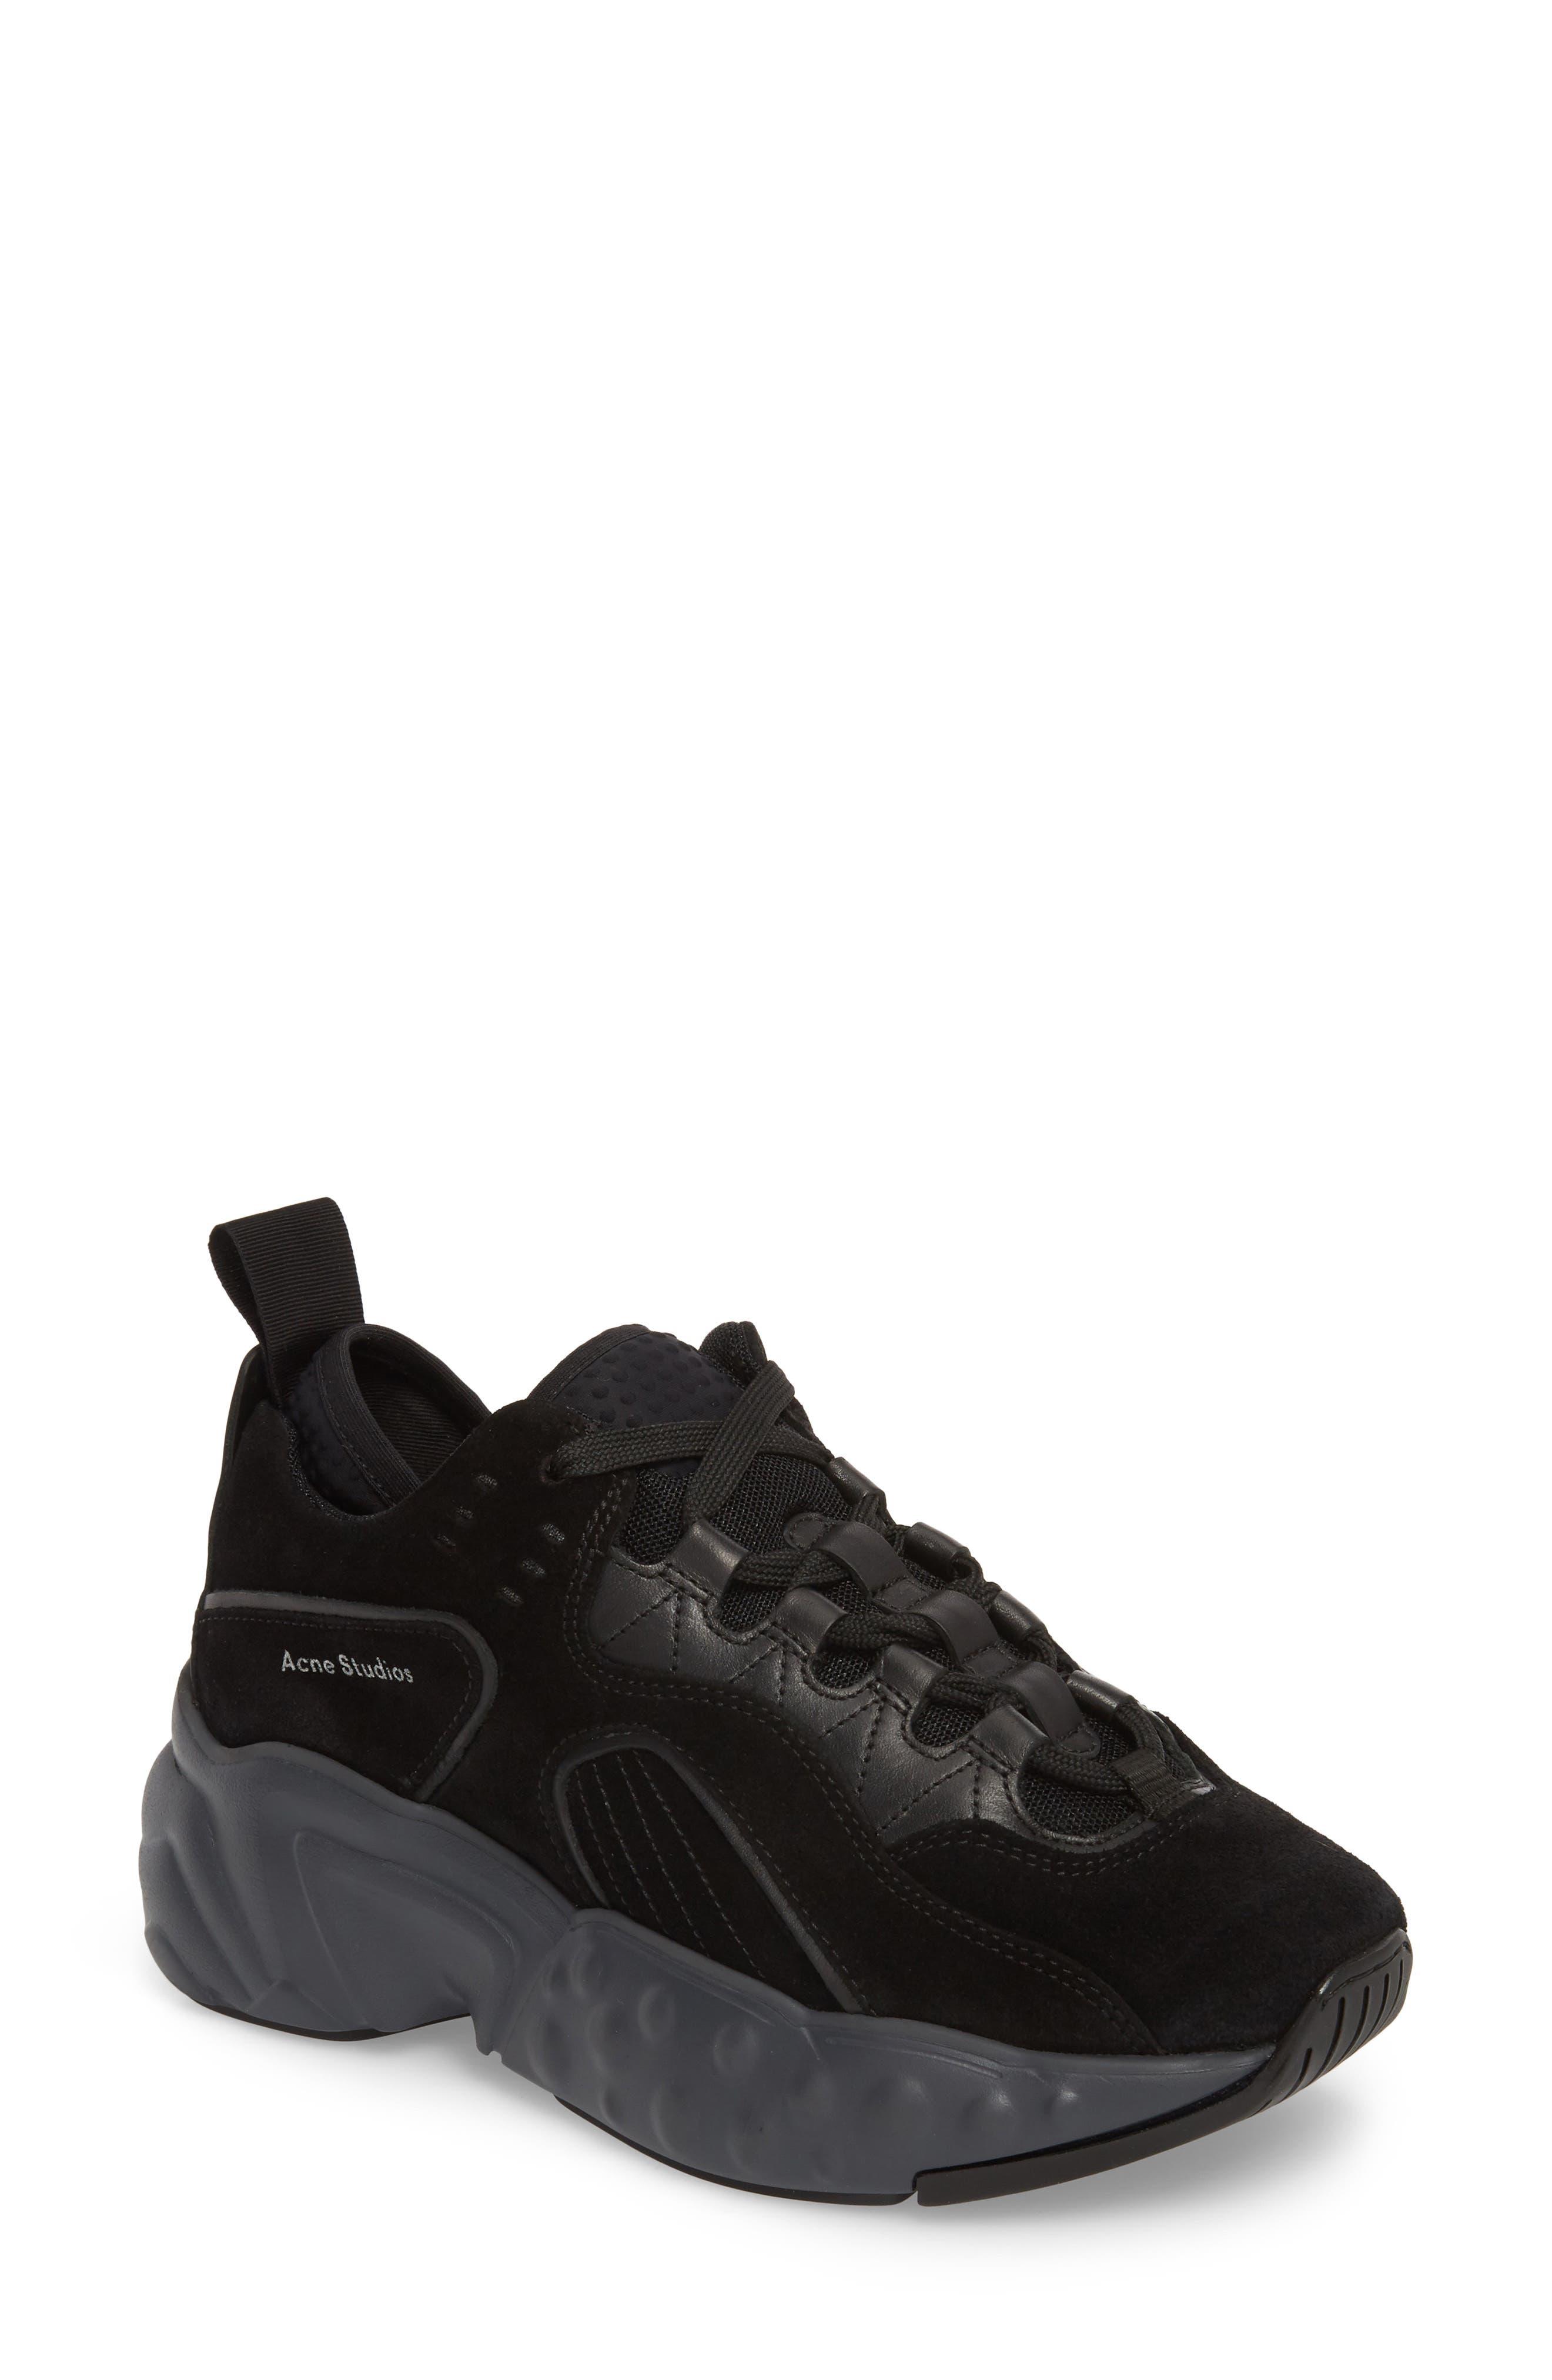 ACNE STUDIOS, Manhattan Sneaker, Main thumbnail 1, color, MULTI BLACK